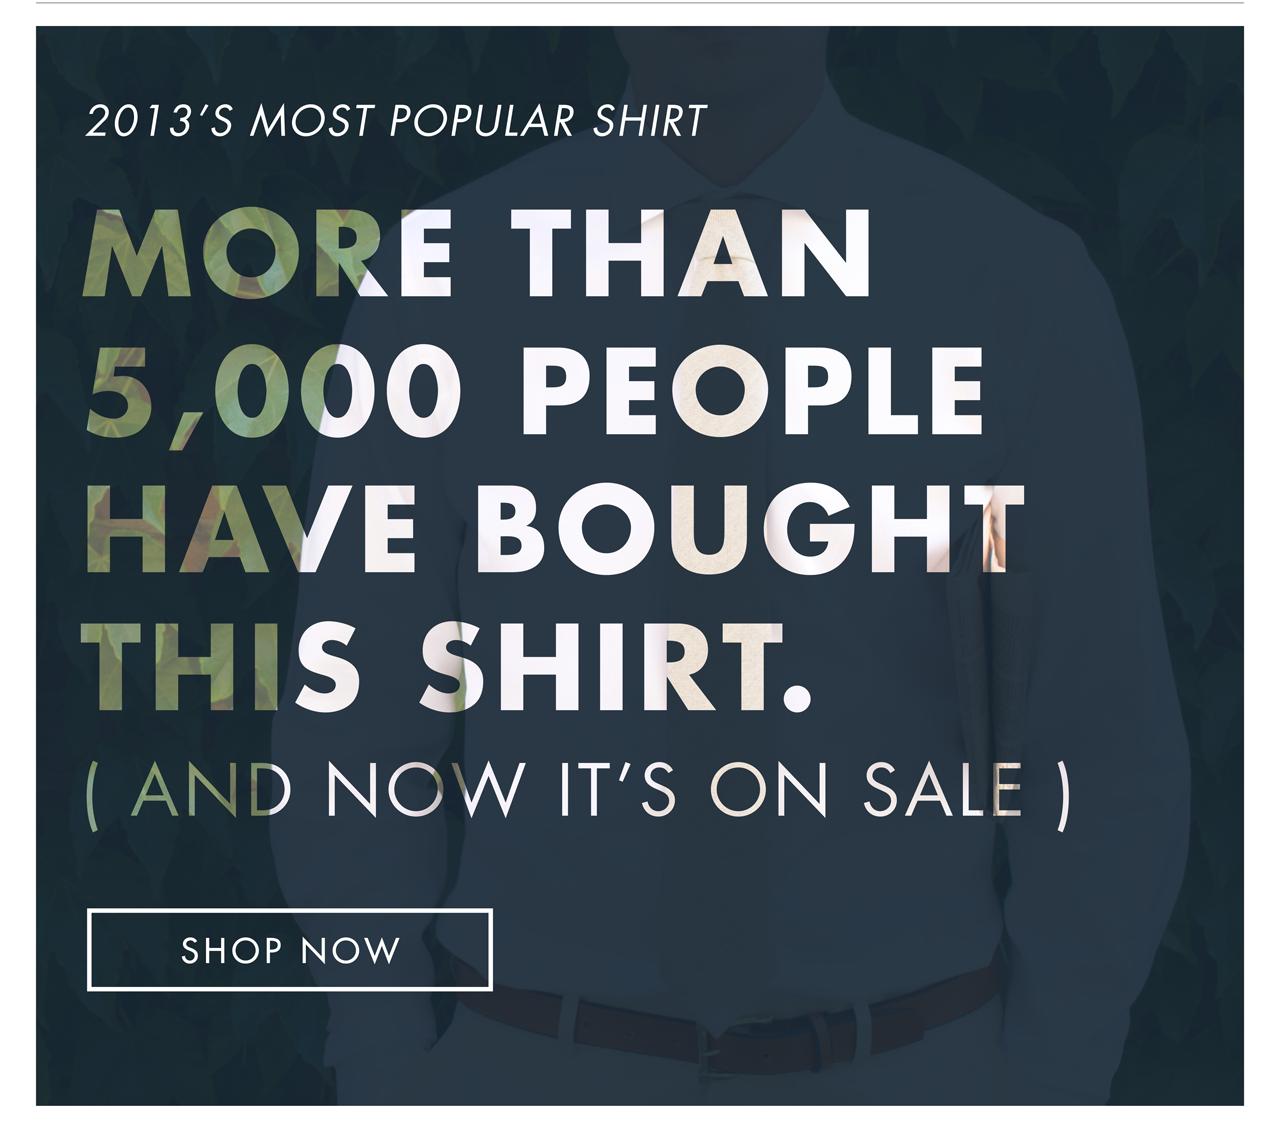 2013 Most Popular Shirt